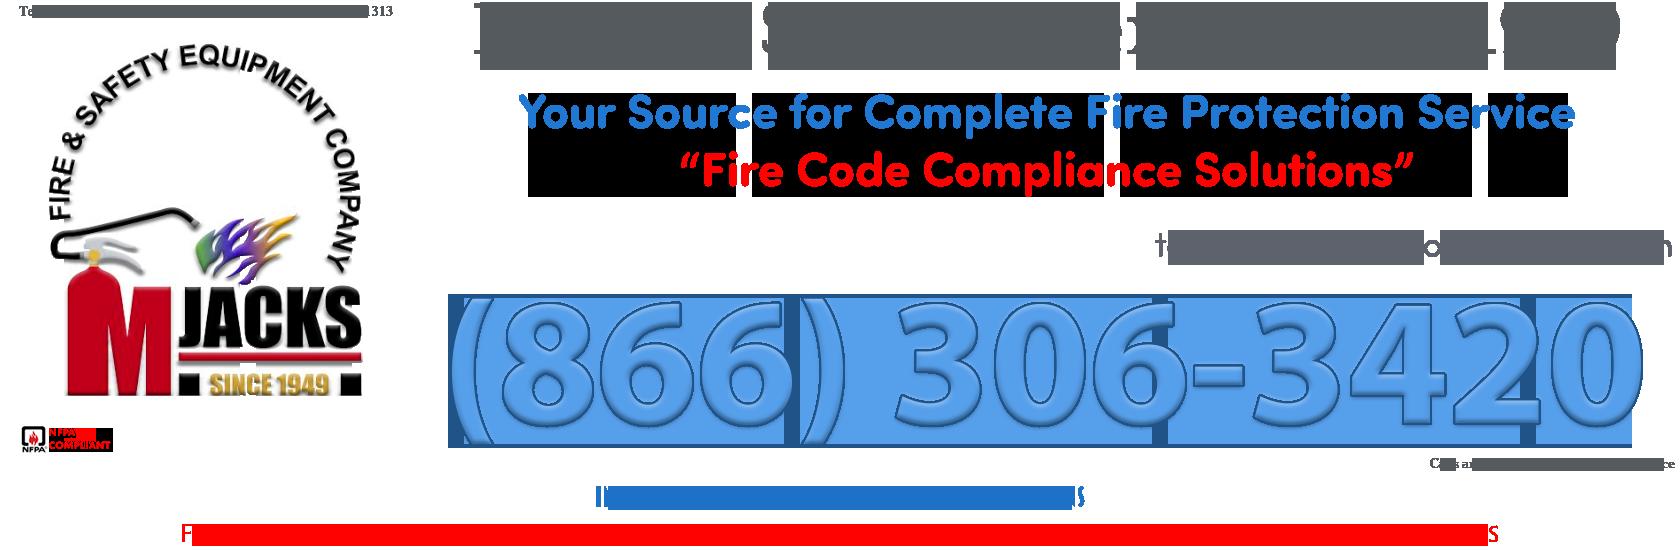 San Antonio, Texas Fire Sprinkler Service Company